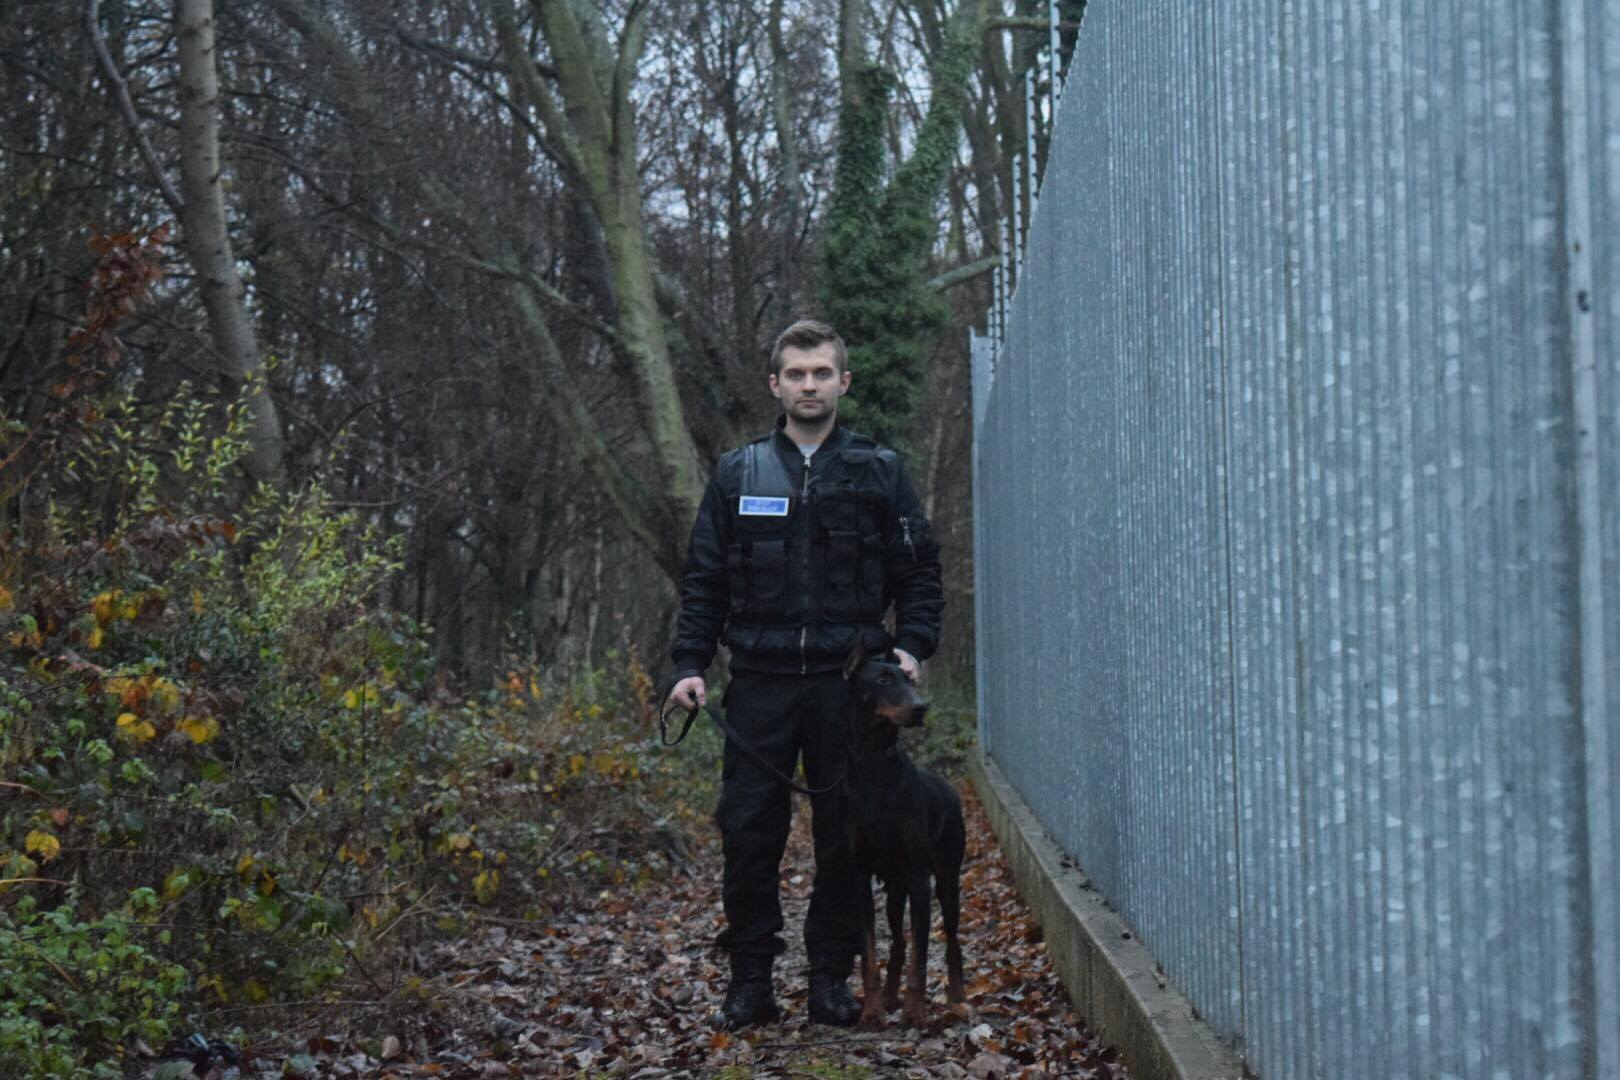 Dog handlers | security k9